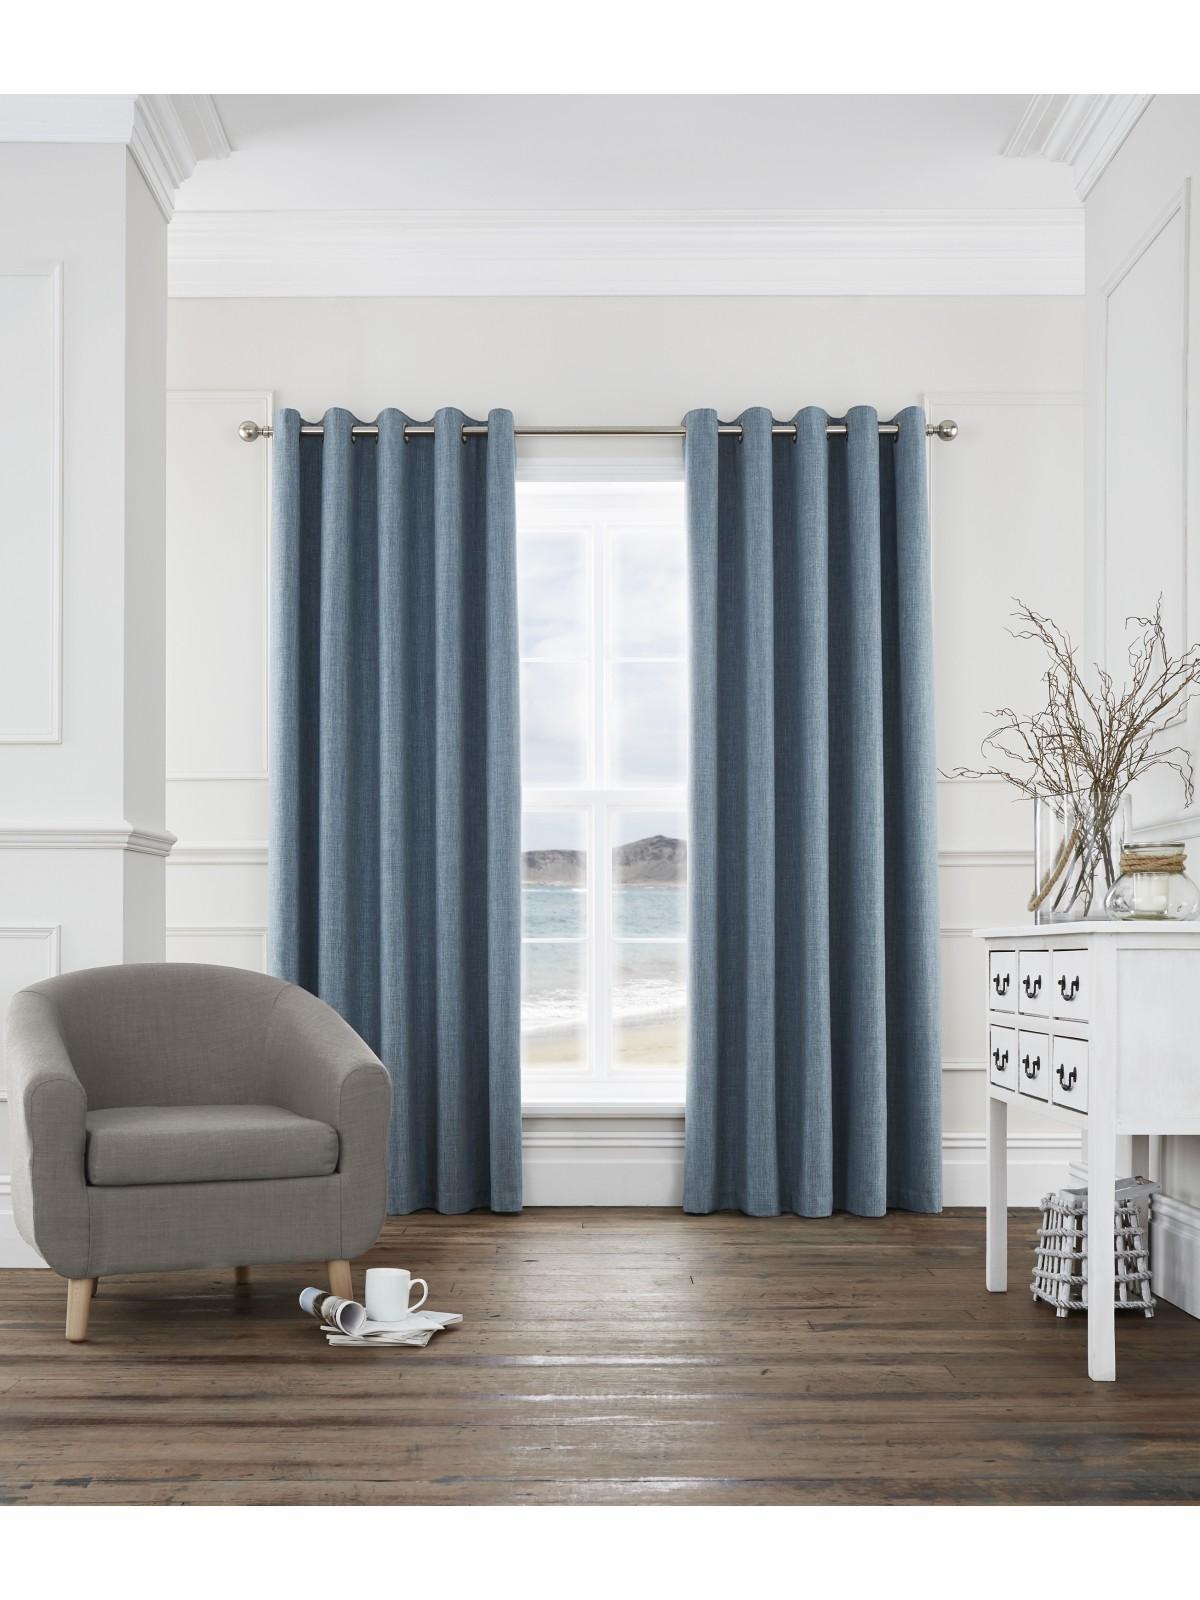 Teal Living Room Curtains Harlow Blackout Eyelet Curtains Teal Ponden Homes